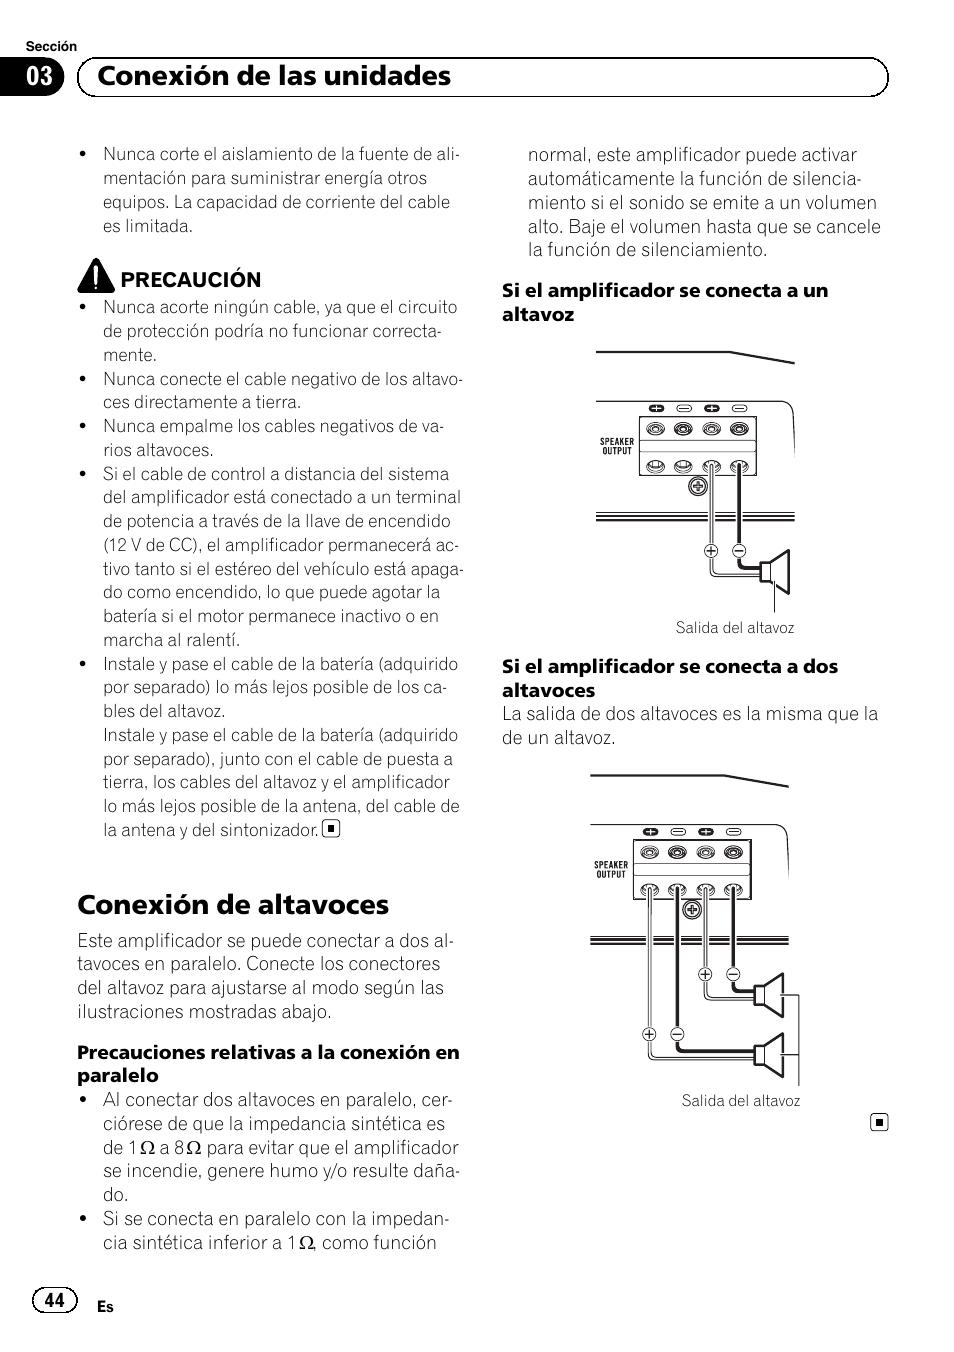 Pioneer Gm 620 Wiring Diagram Schematic Diagrams Rover User Manual Various Owner Guide U2022 Sterling Lt9500